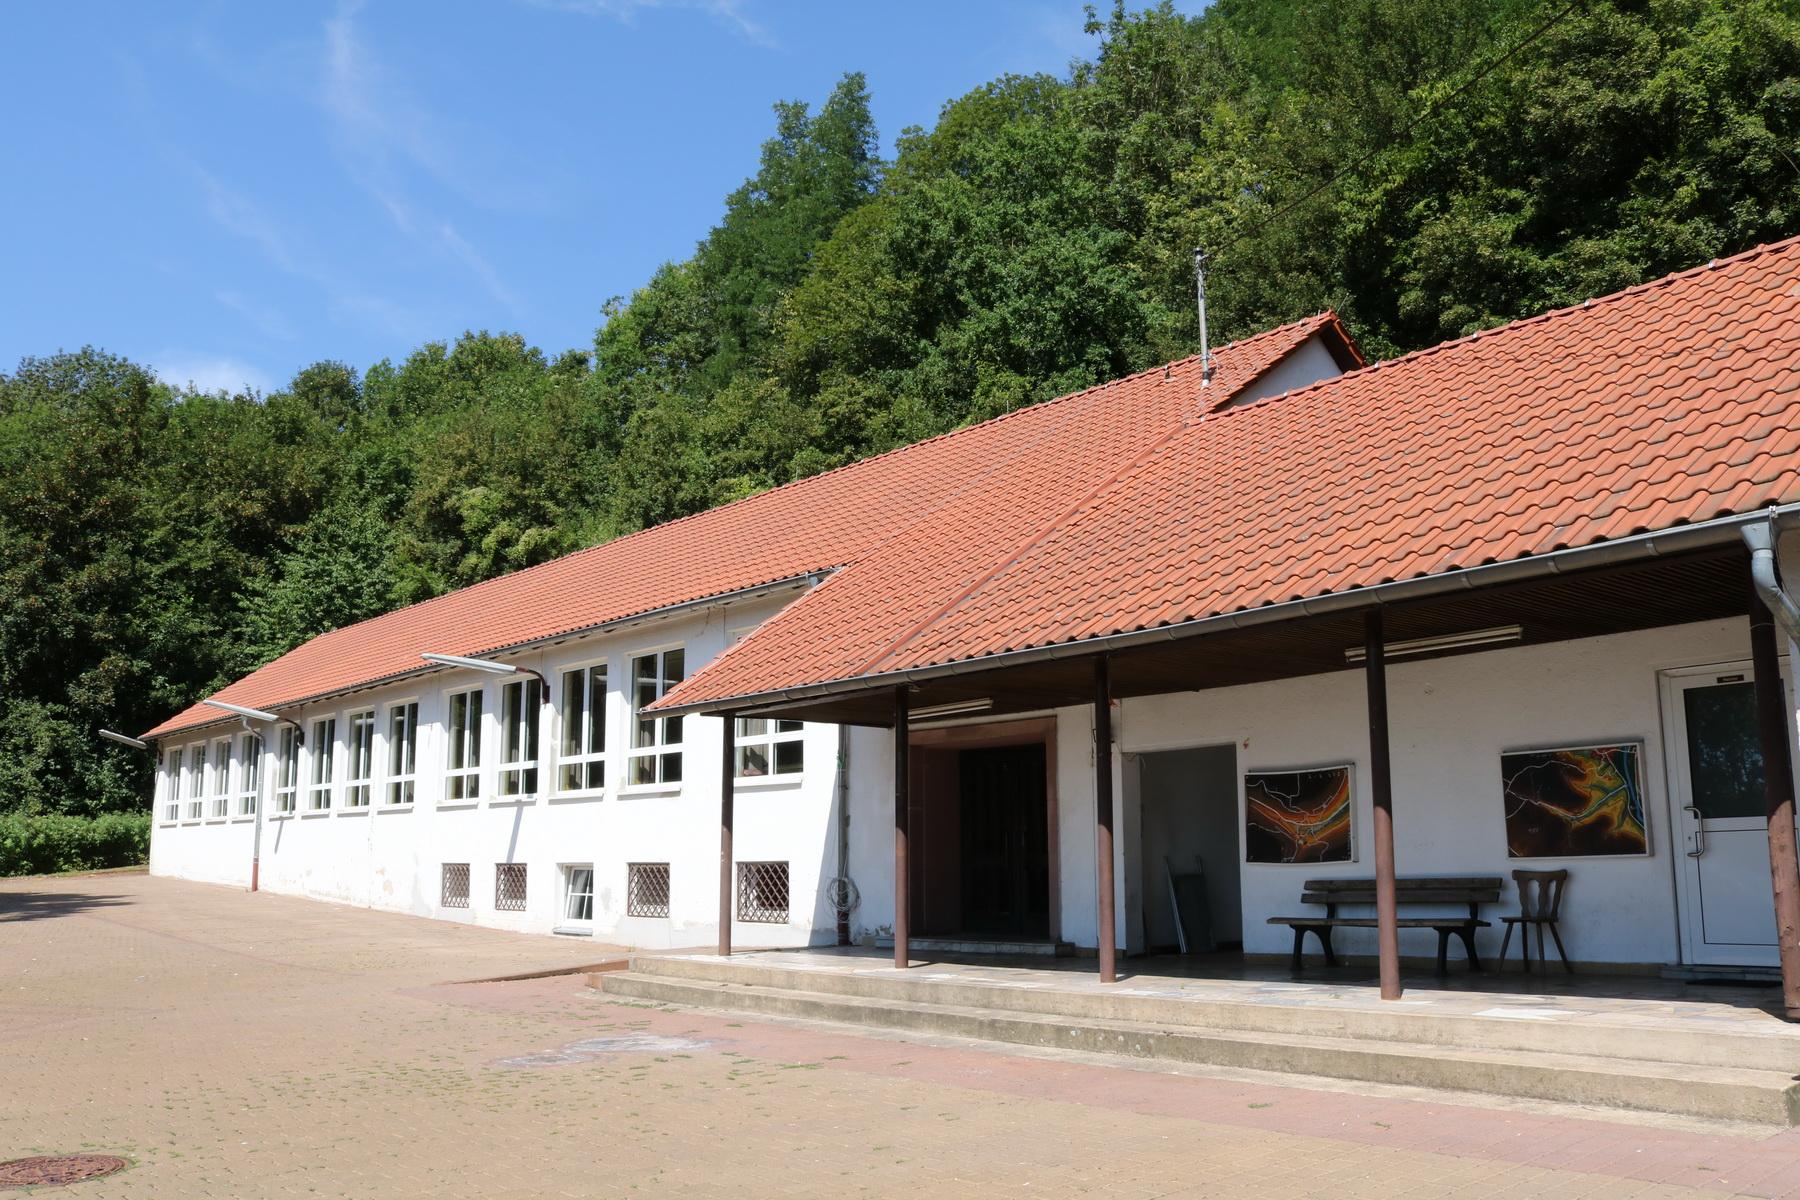 Bürgerhaus Mondorf Frontansicht